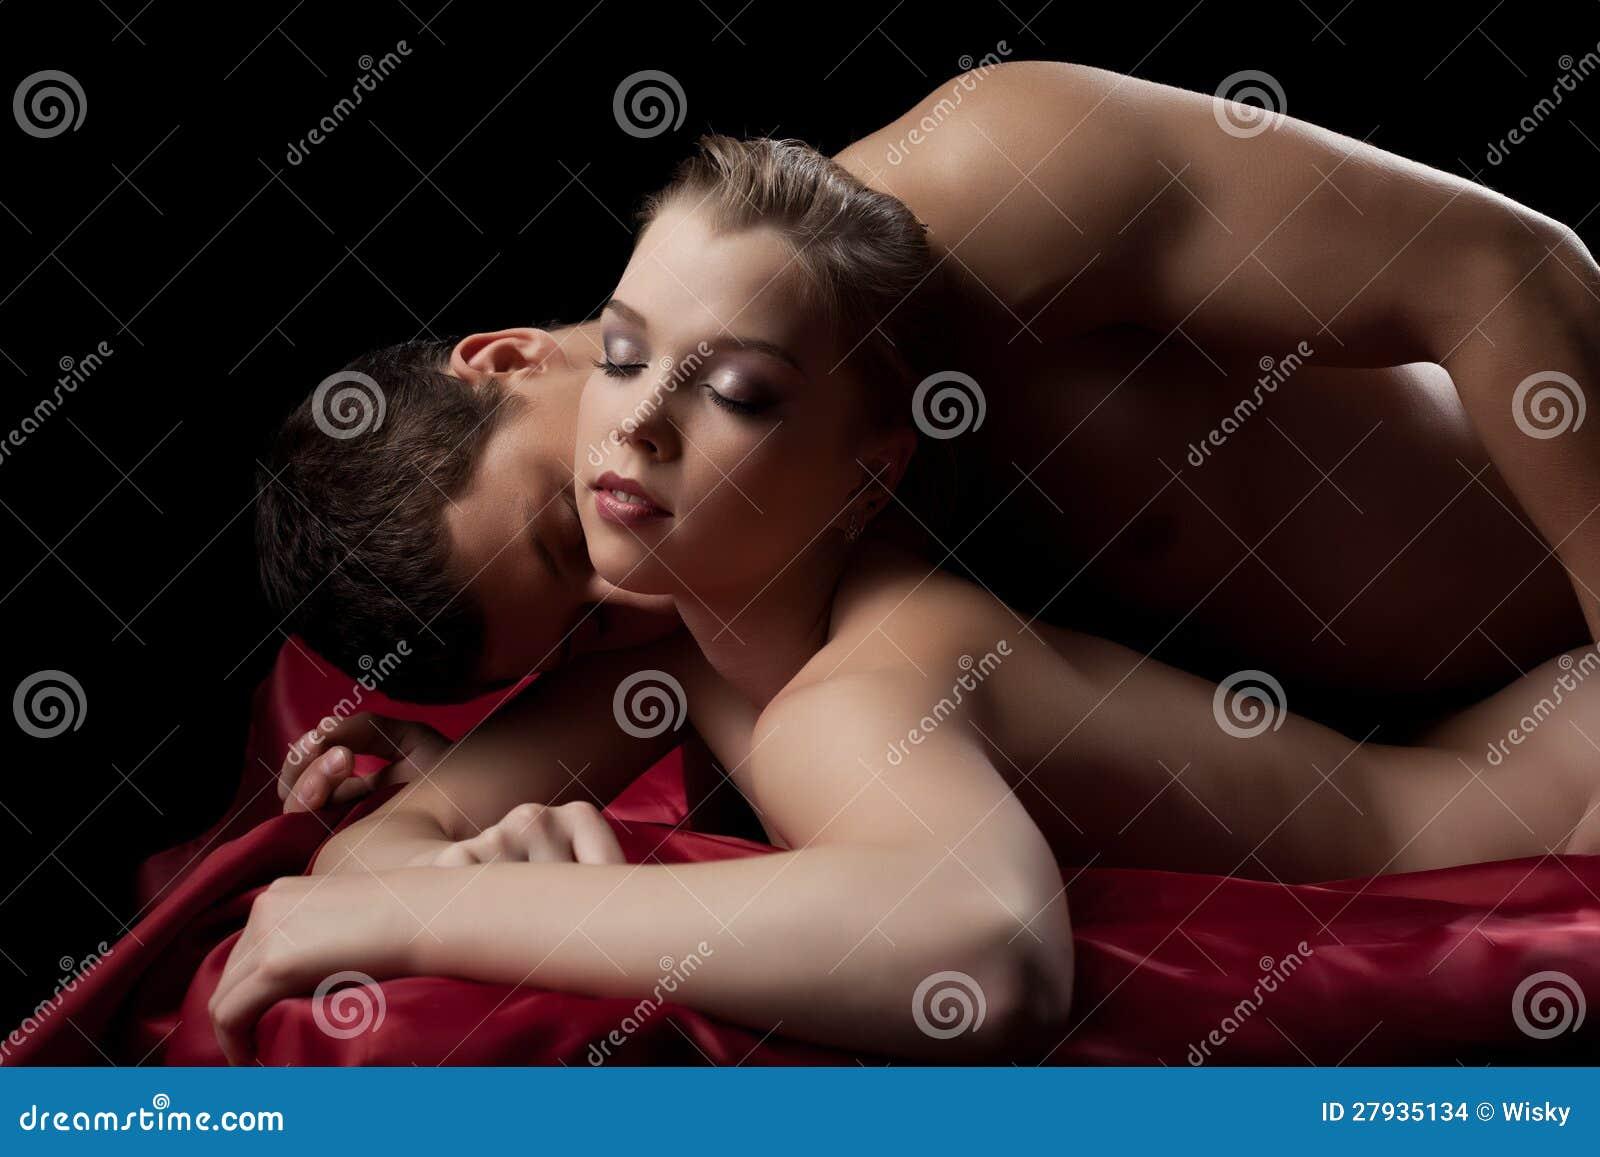 Секс услуги питер госпожа 1 фотография